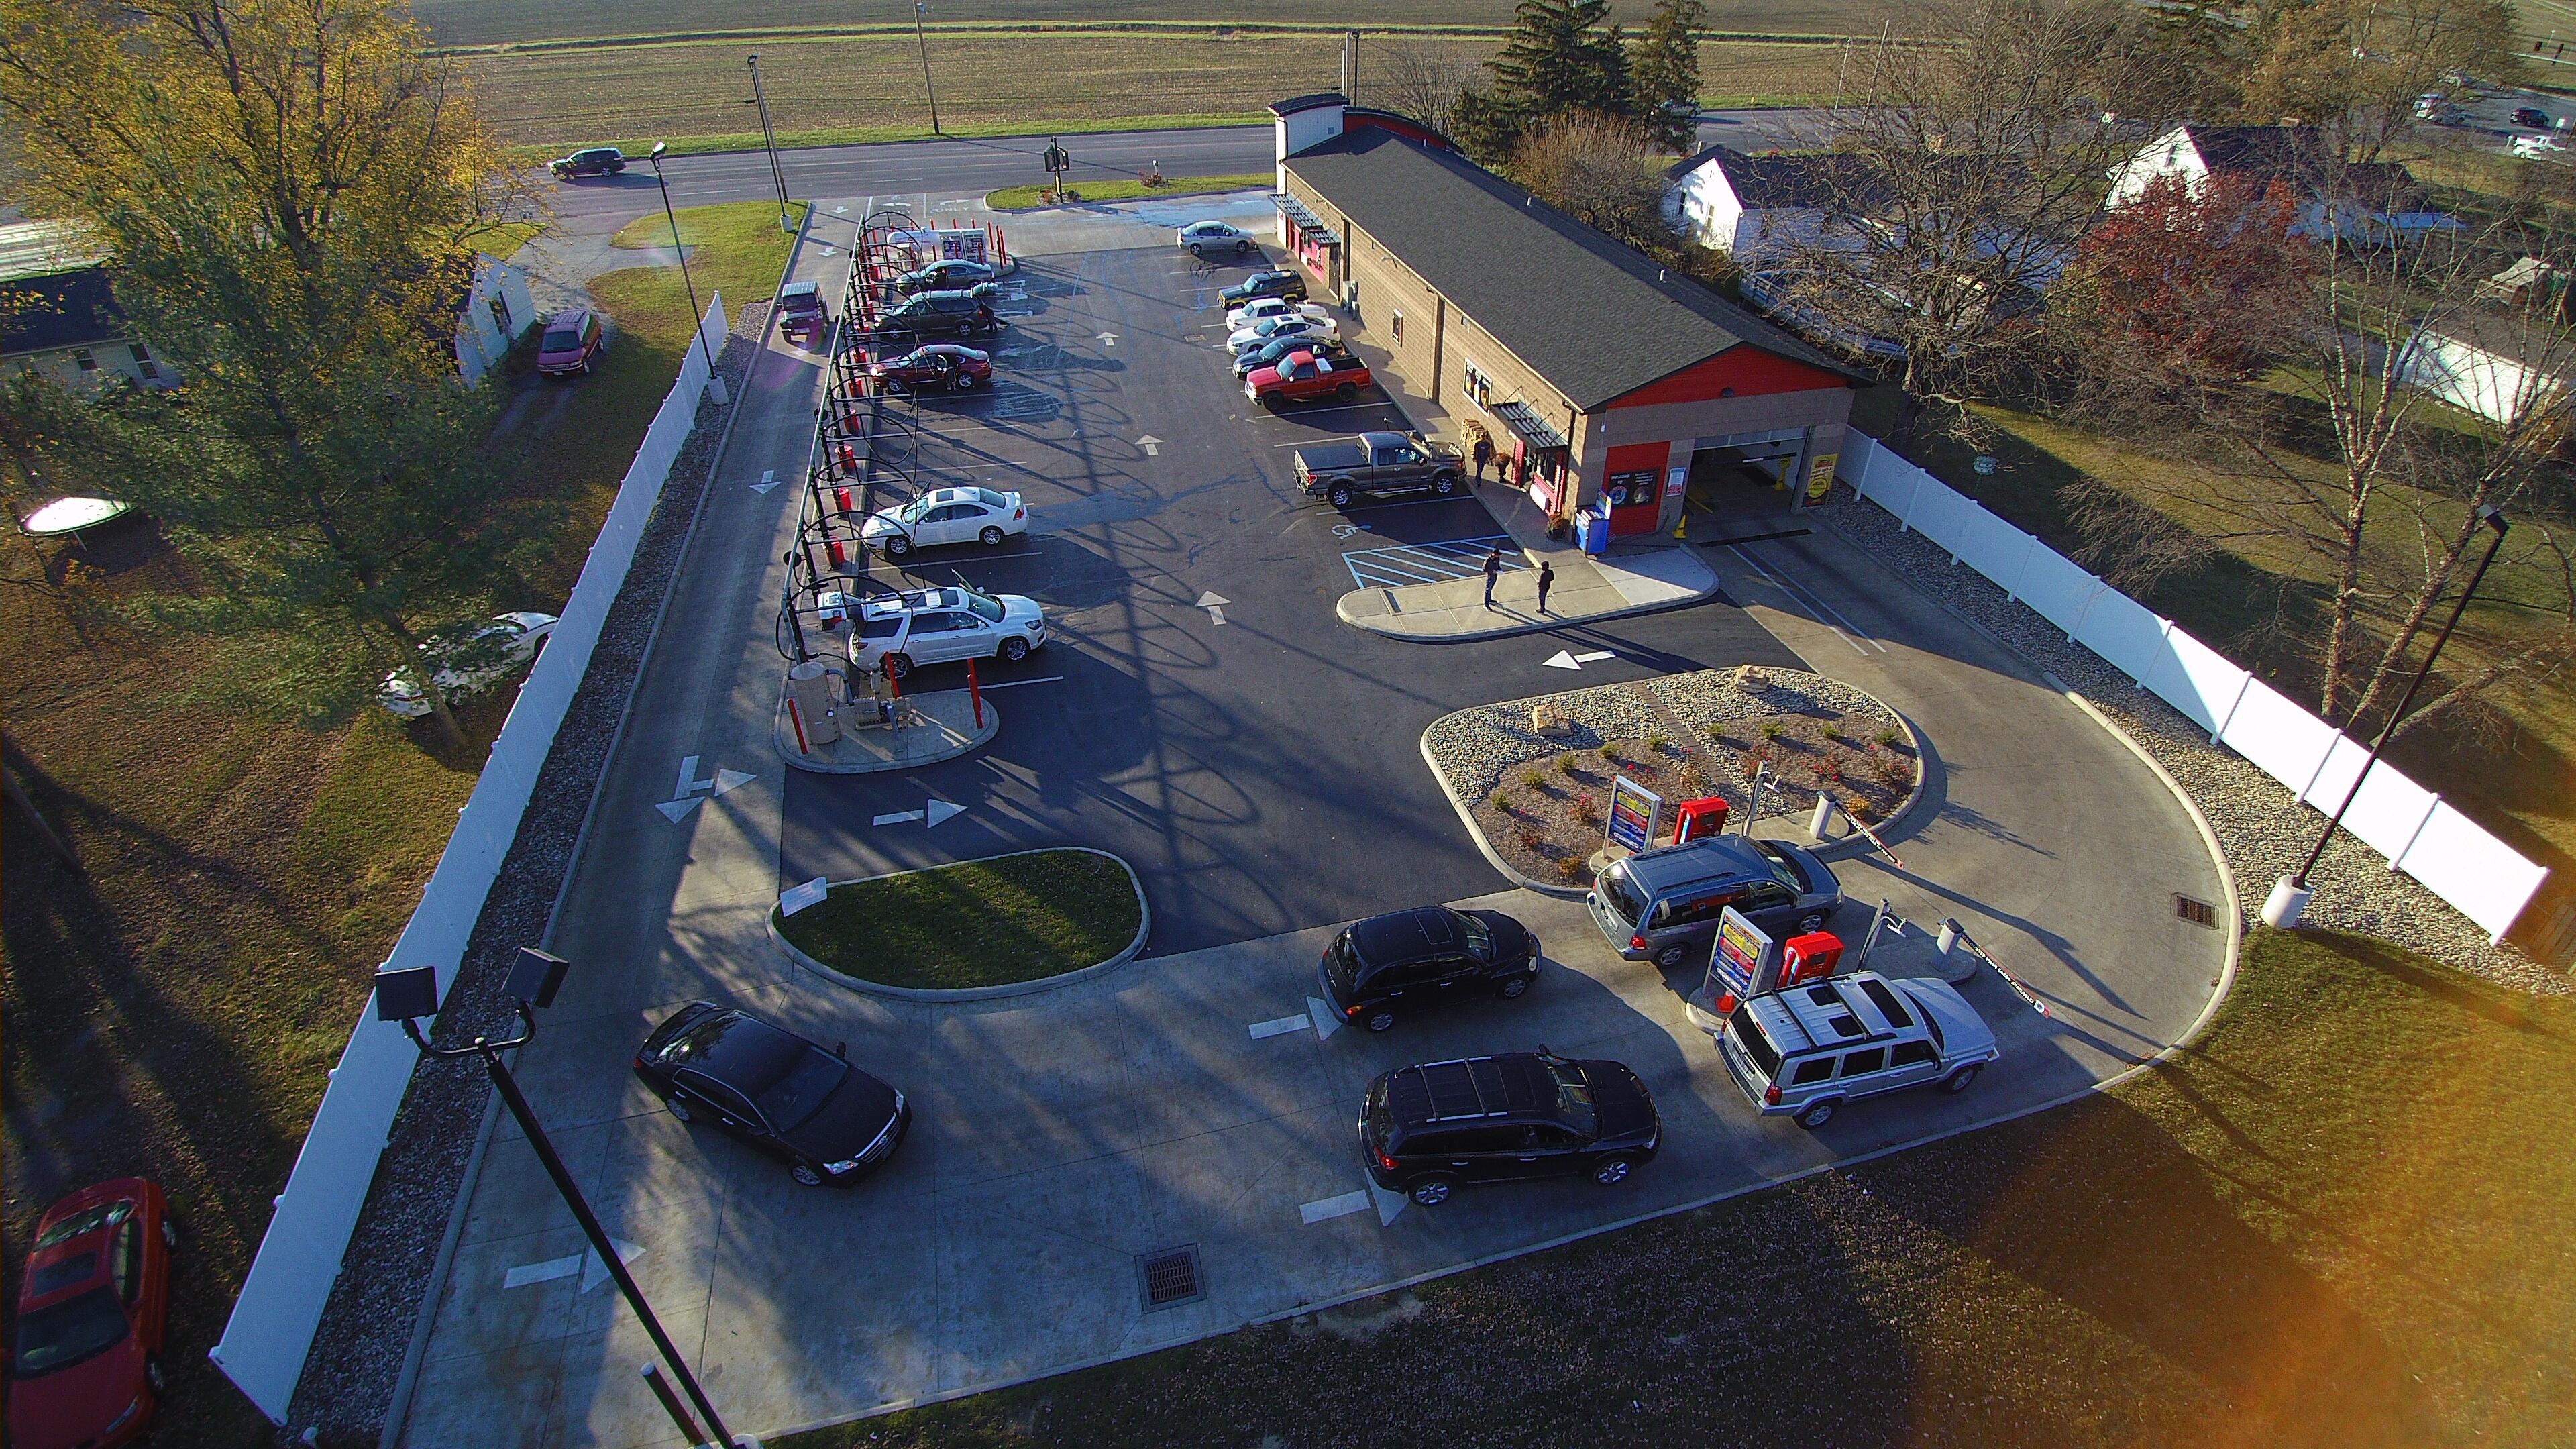 Self Serve Car Washes Near Me: Bruster's Car Wash, Lima Ohio (OH)